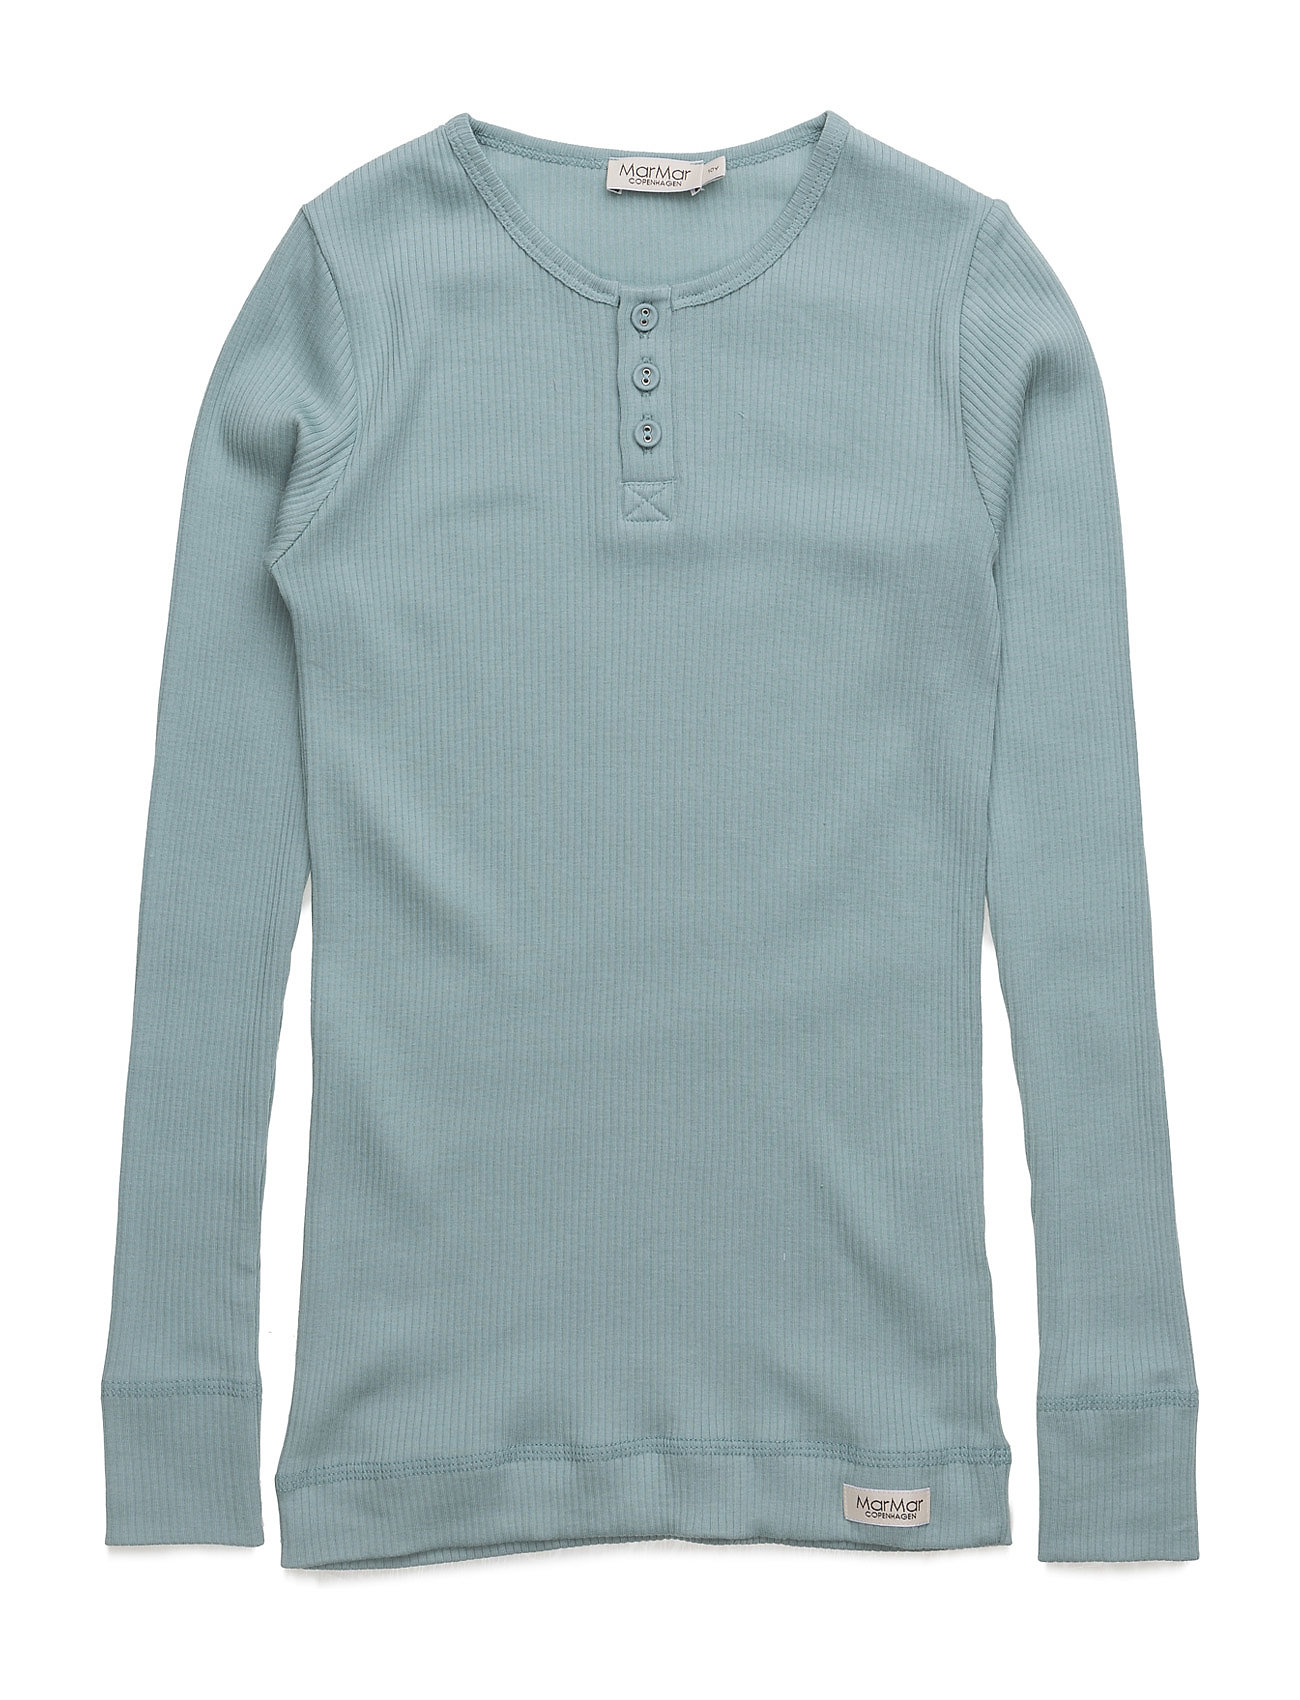 Tee Ls MarMar Cph Langærmede t-shirts til Børn i